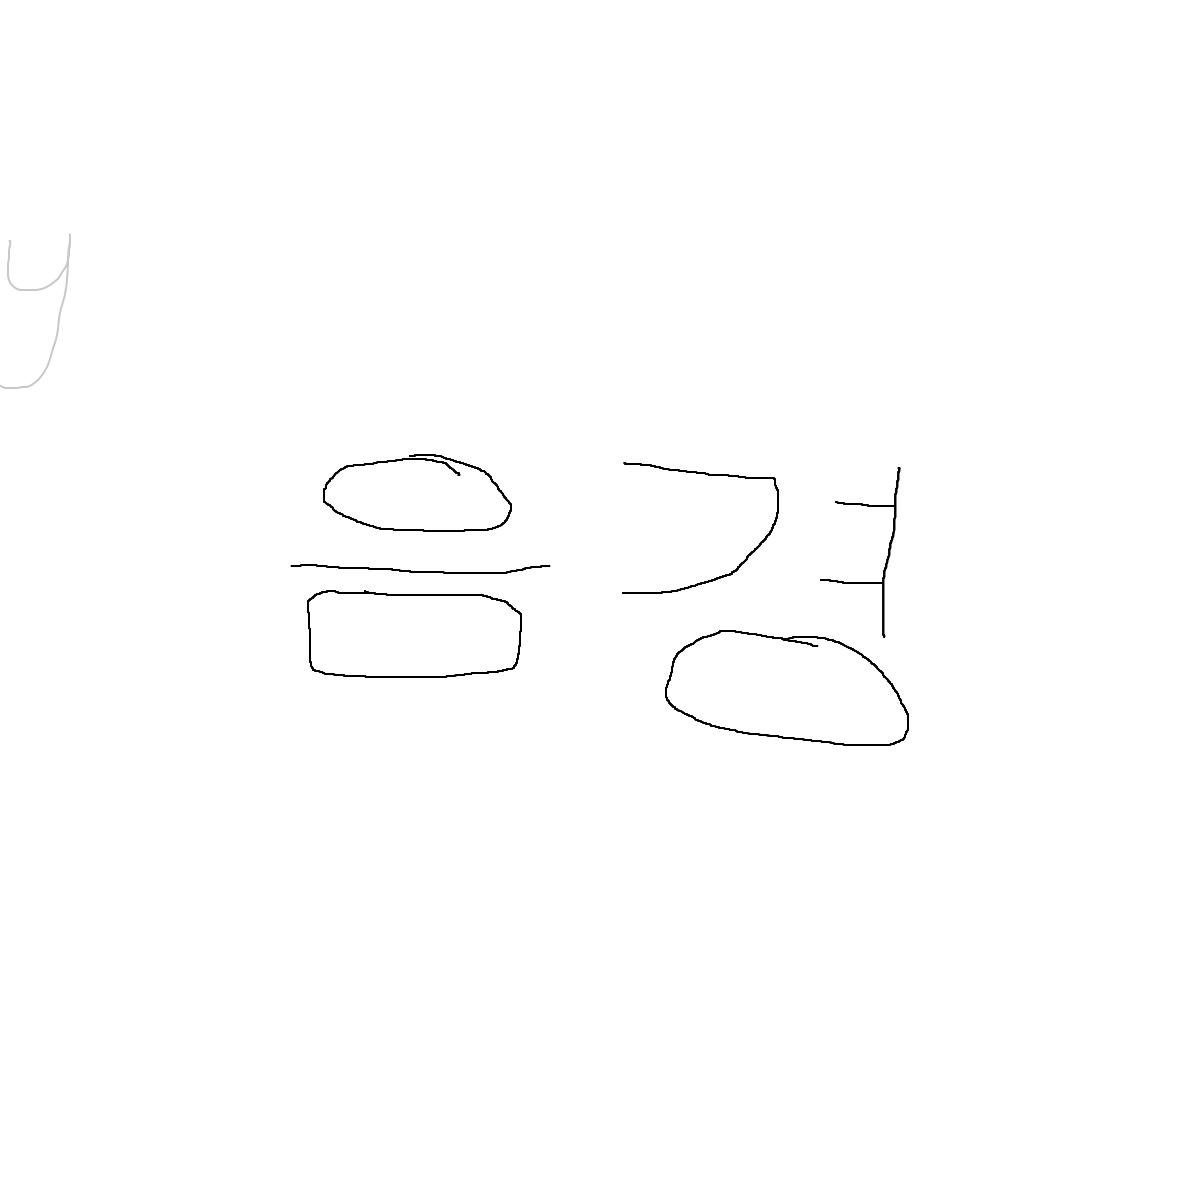 BAAAM drawing#7585 lat:39.0251884460449200lng: 125.7609176635742200